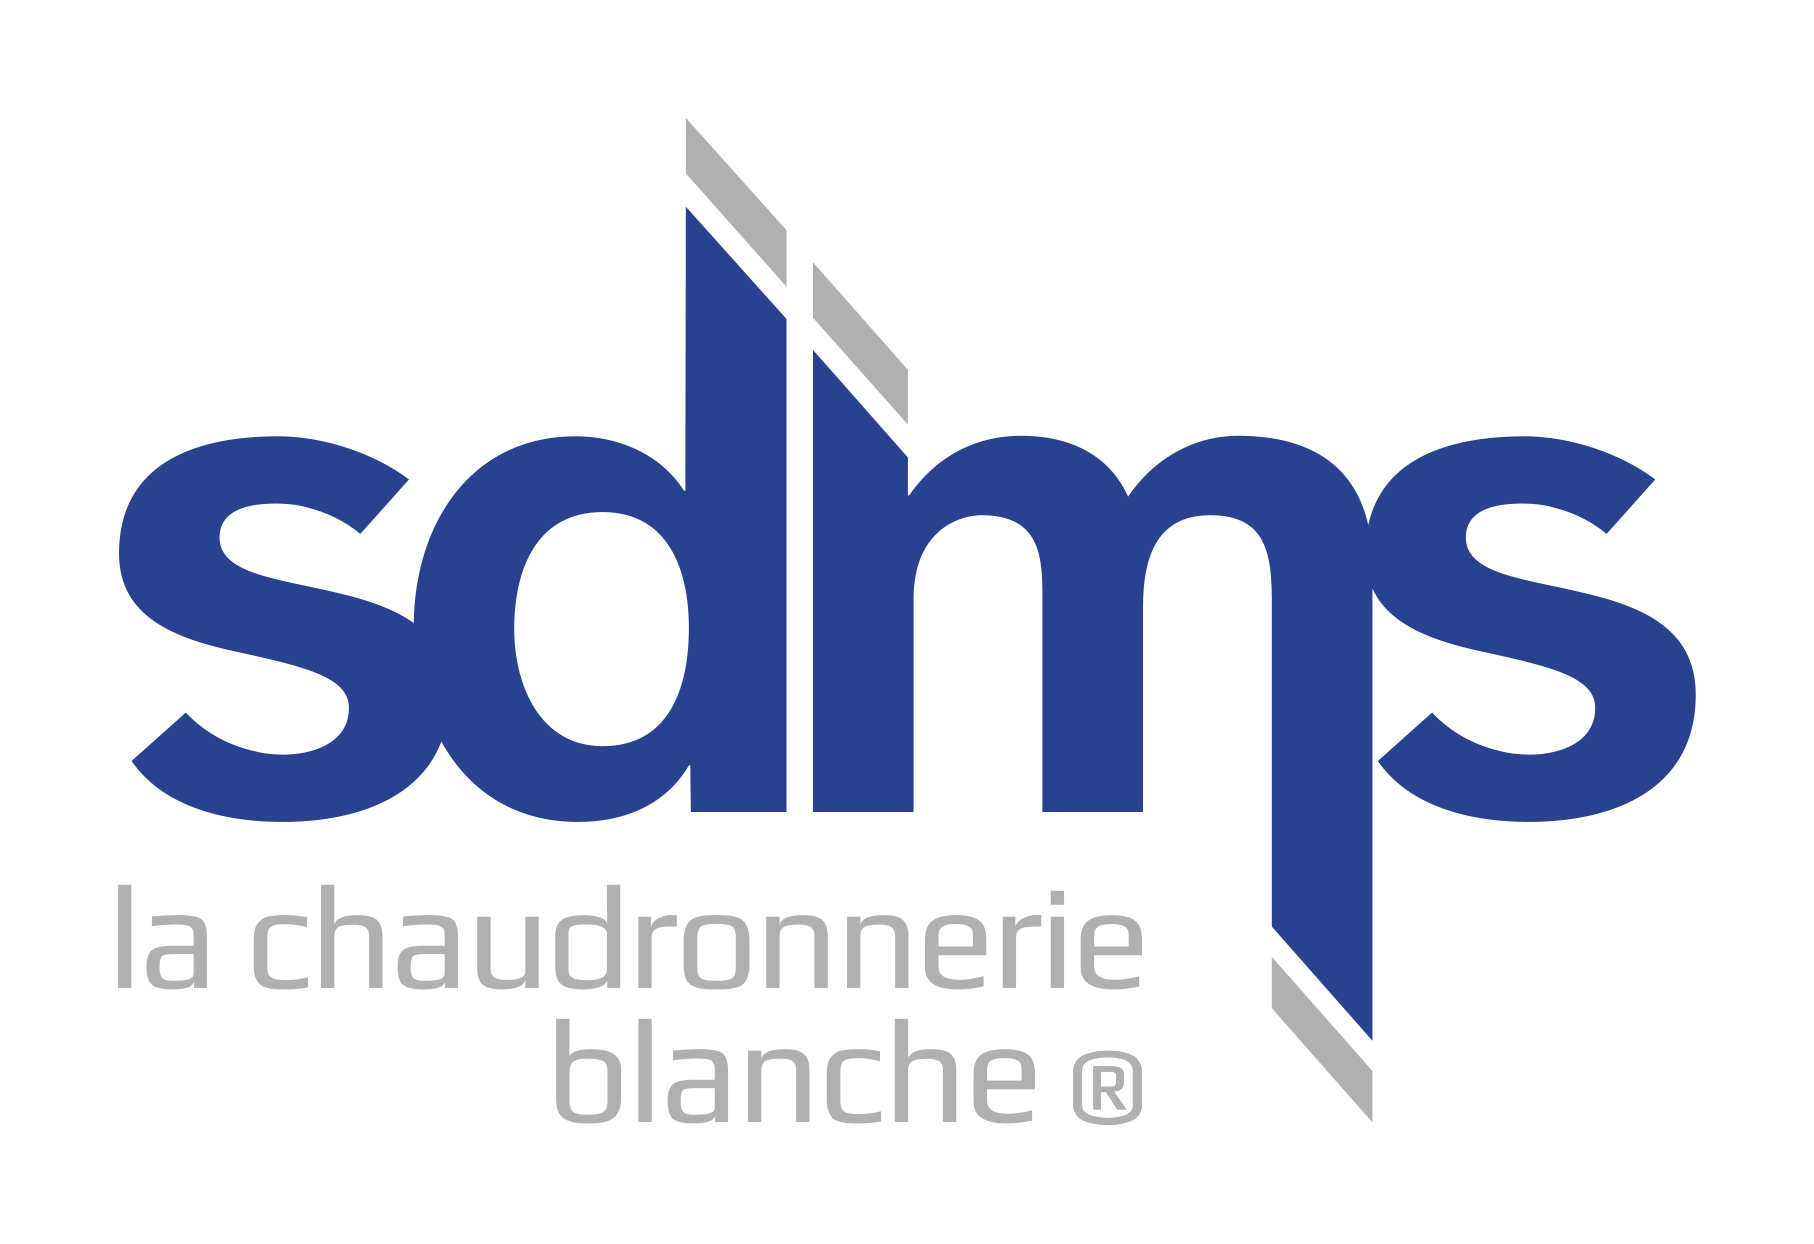 Logo SDMS la chaudronnerie blanche